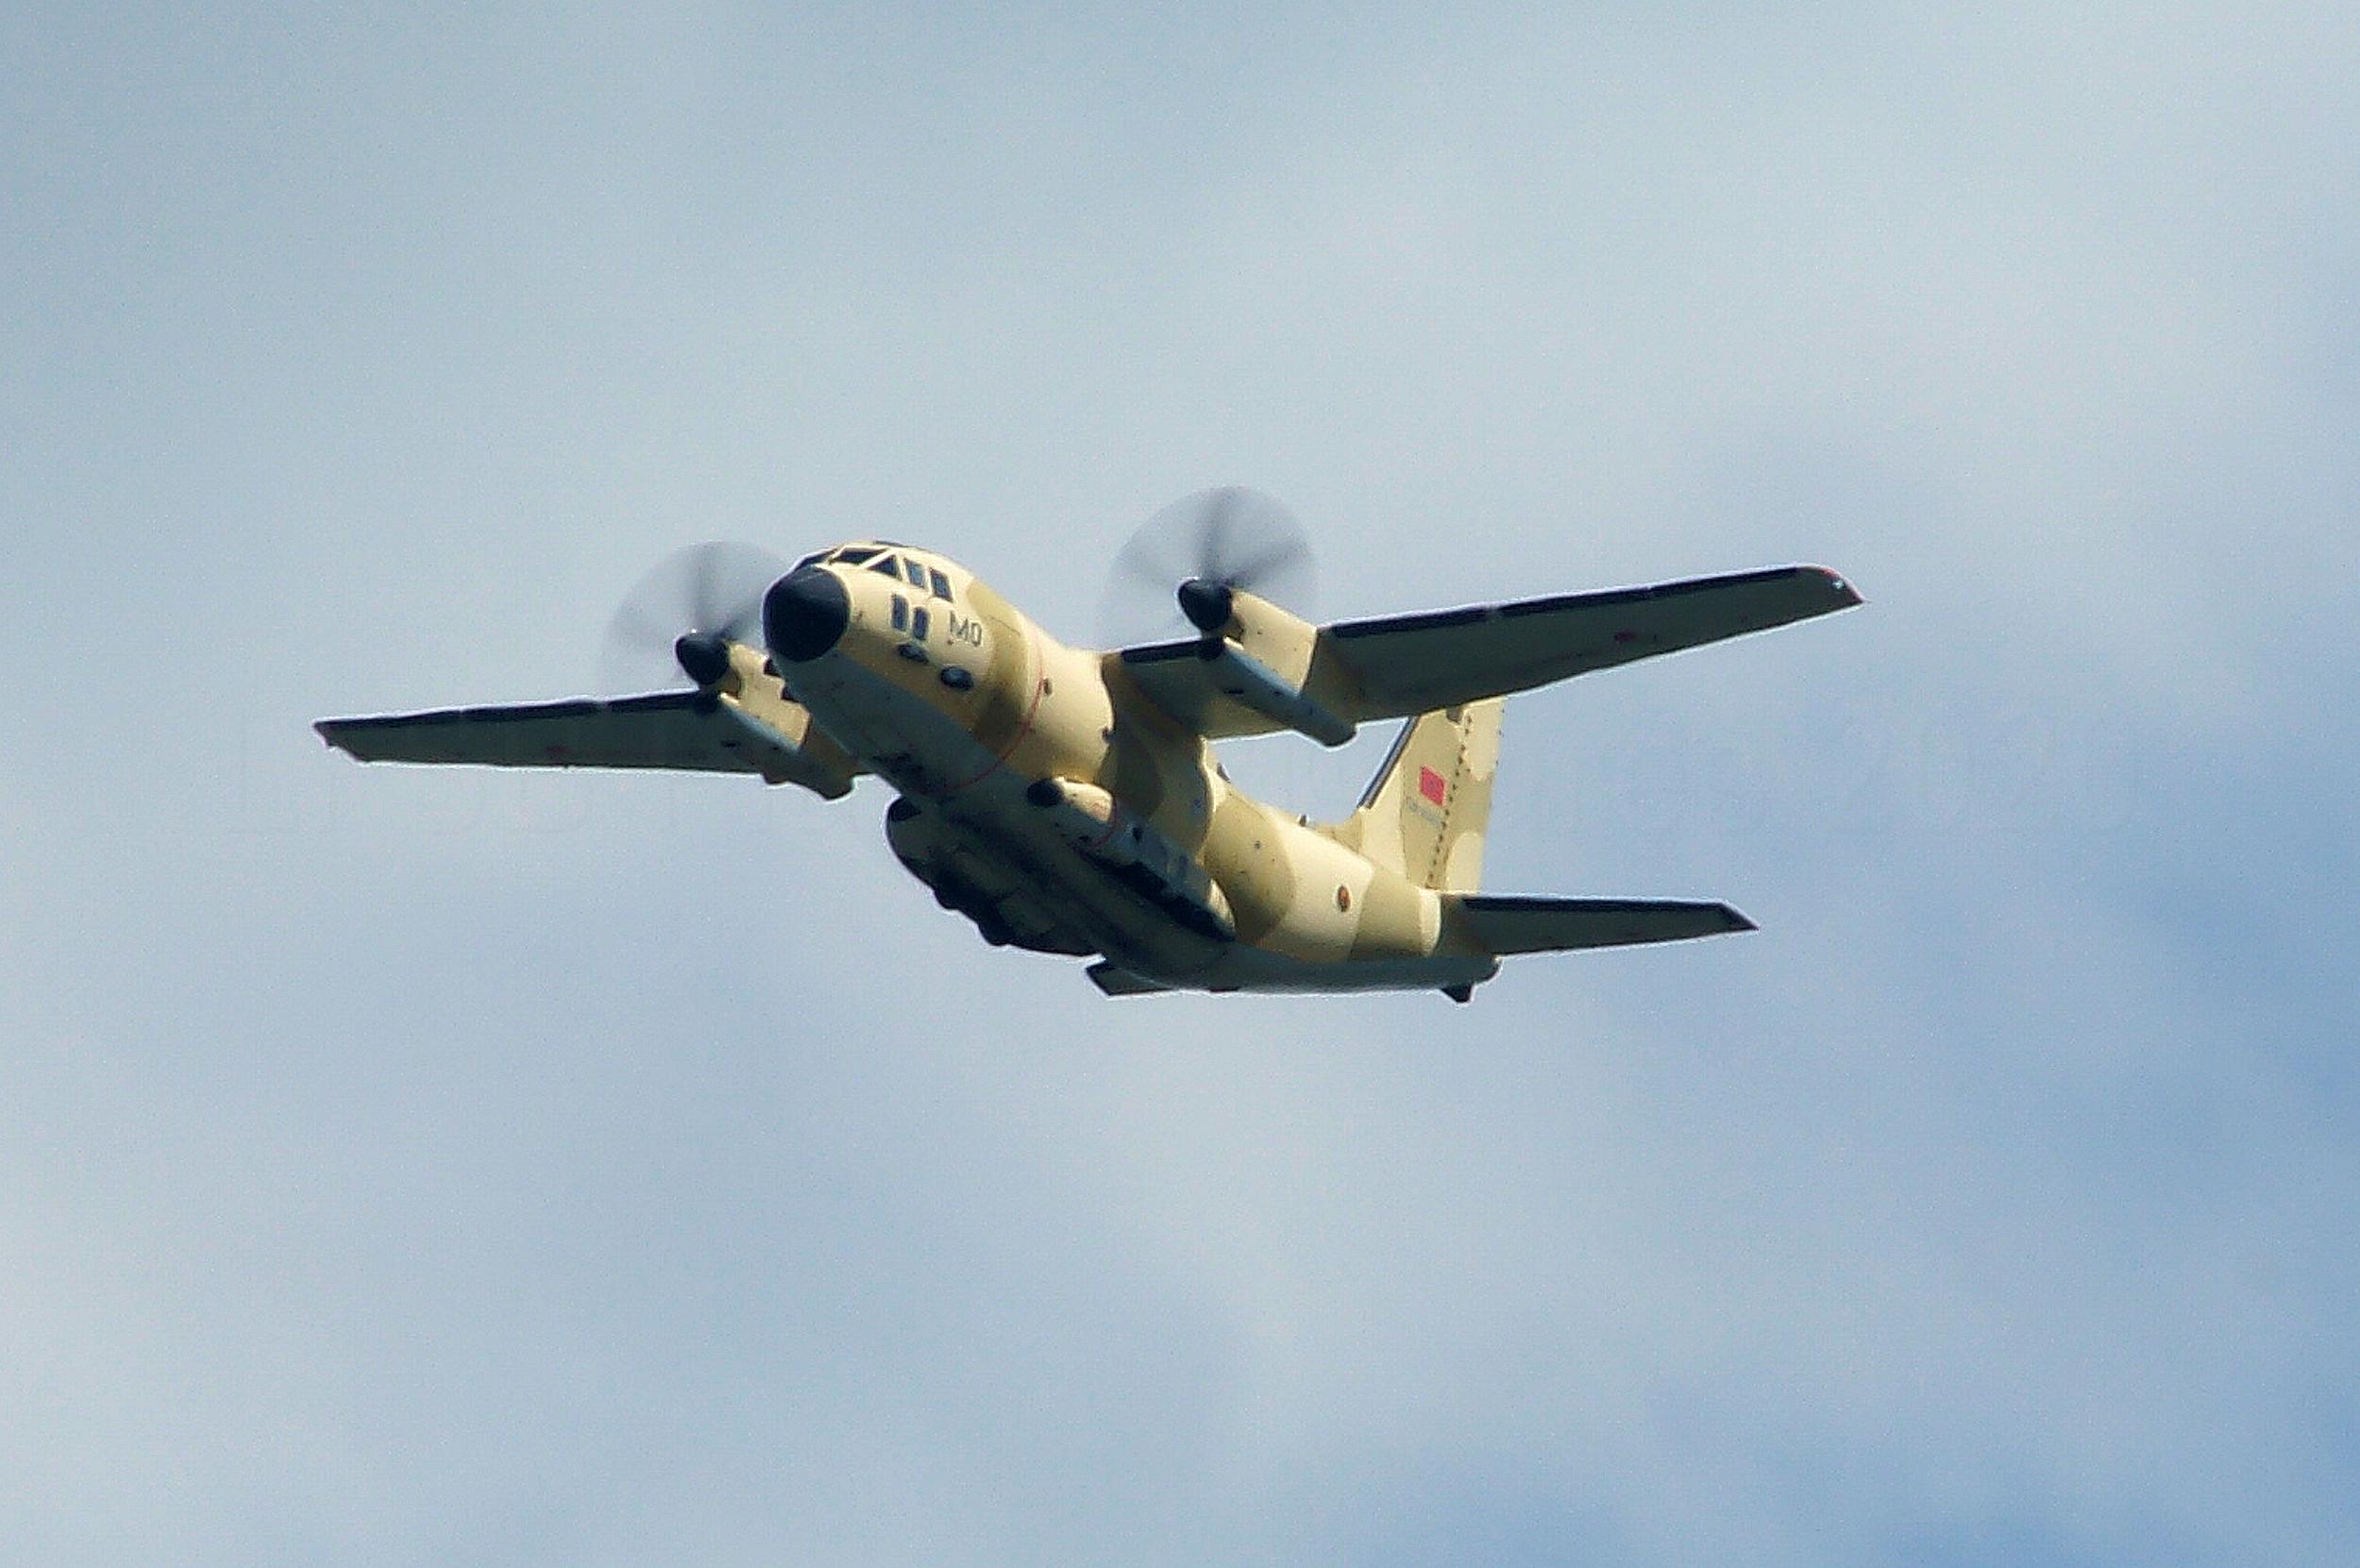 FRA: Photos d'avions de transport - Page 40 49855109181_9f5ab490ac_o_d